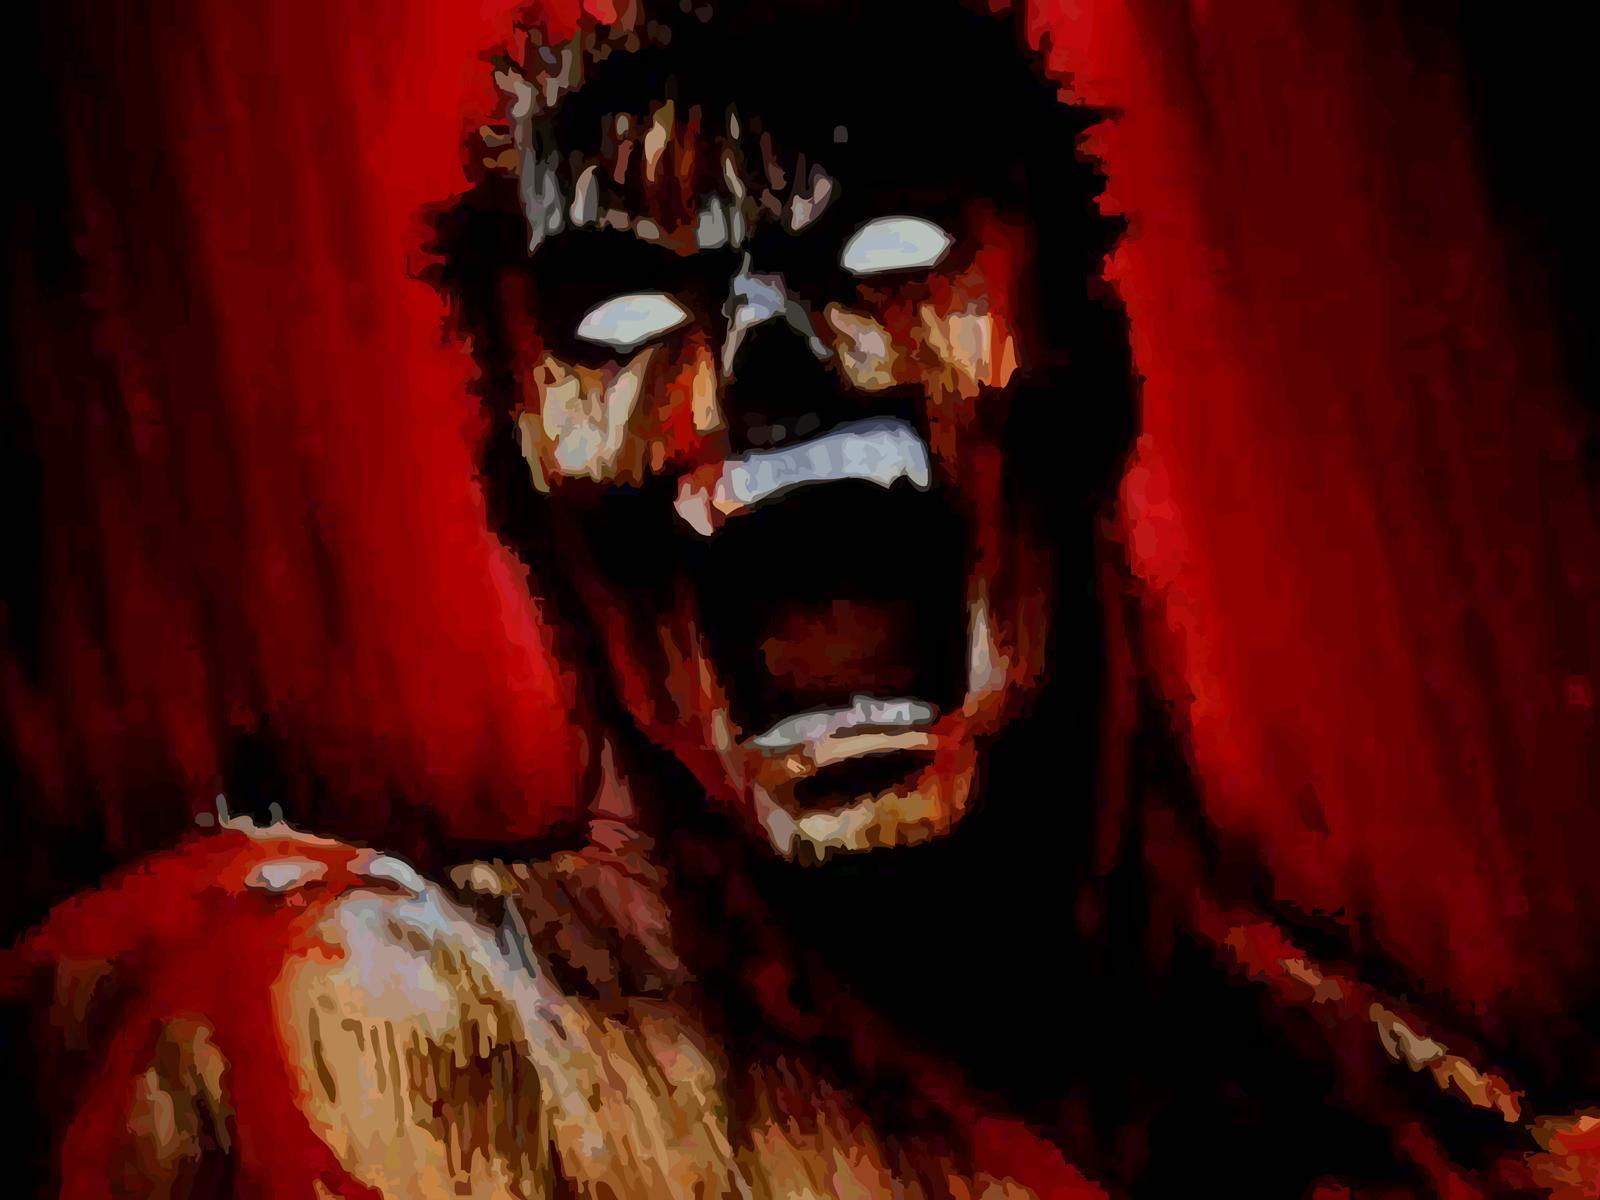 Animes Demon Wallpapers Berserk 1600x1200